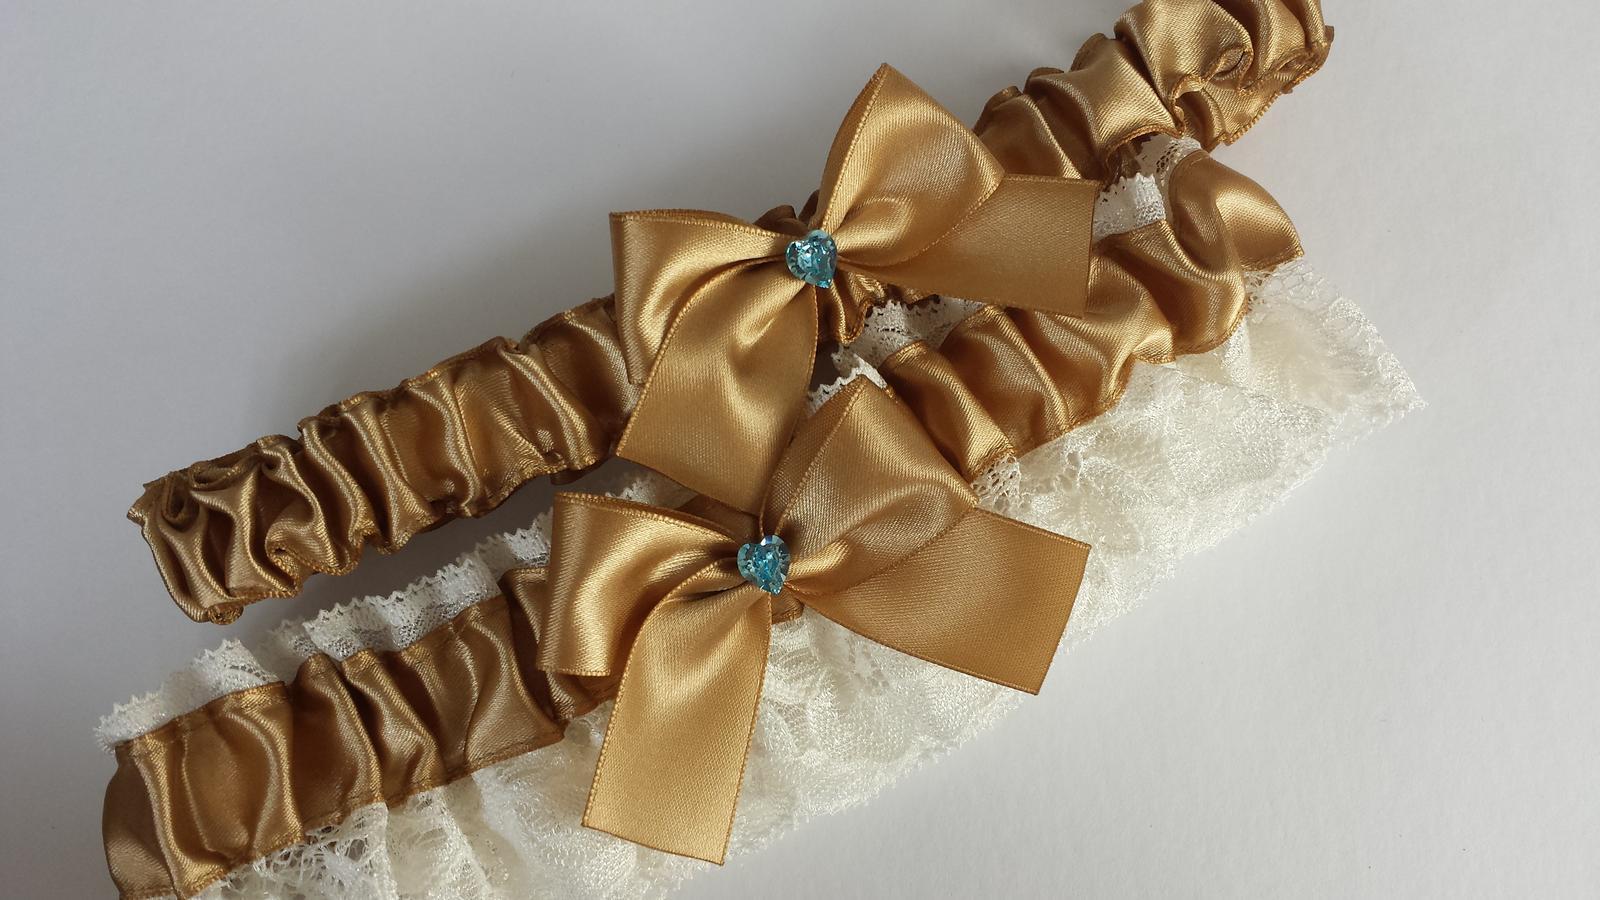 Sada zlatých SW podvazků - ivory krajka - Obrázek č. 1